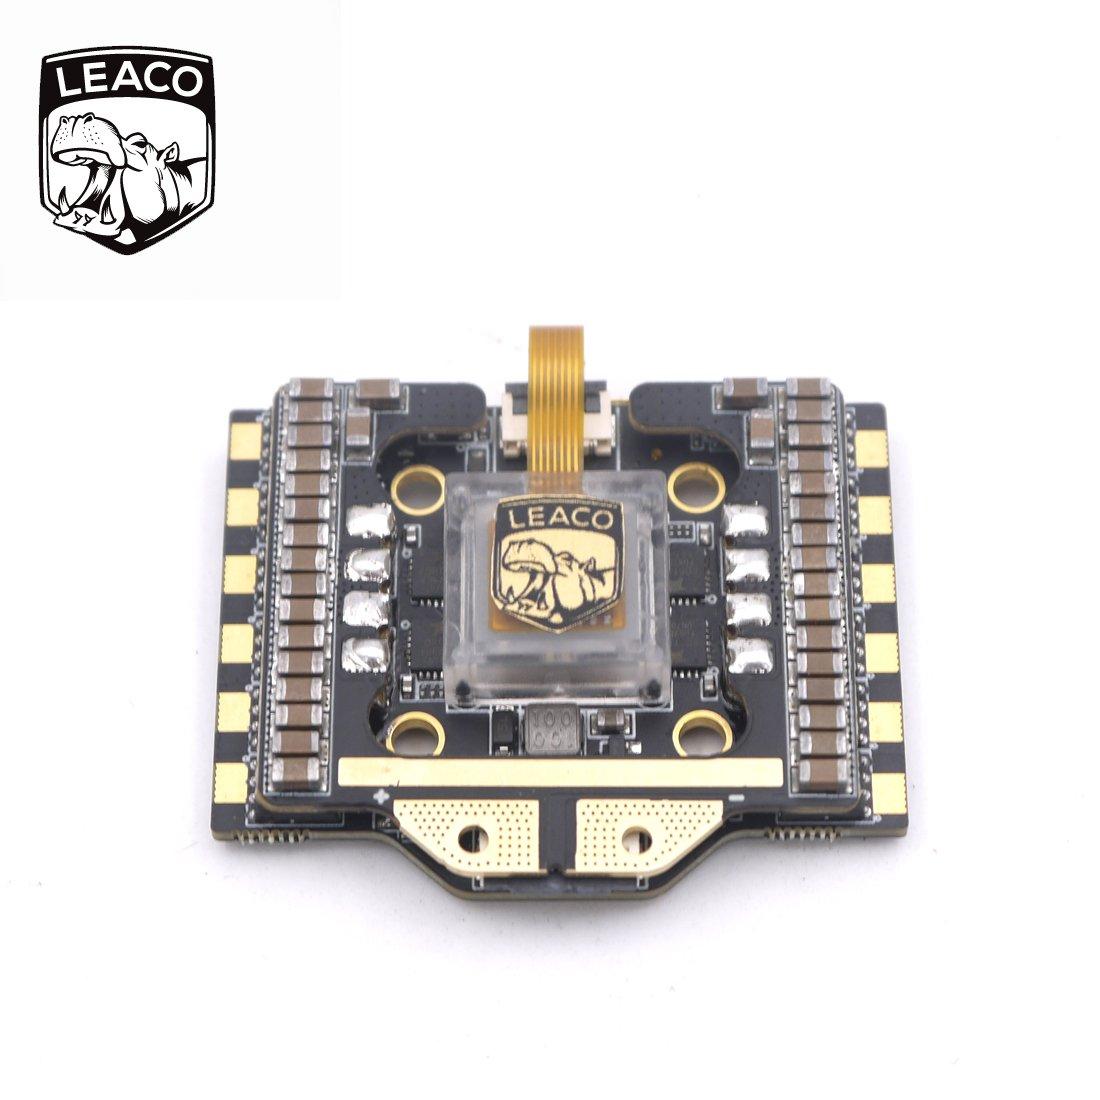 leaco Noxフライトコントローラーwith stm32 F411 MCU icm20608 MPU /ジャイロ(交換可能) 4 x 35 A BLHeli _ 32 ESC forクアッドコプターDrone B07BKYDH6K